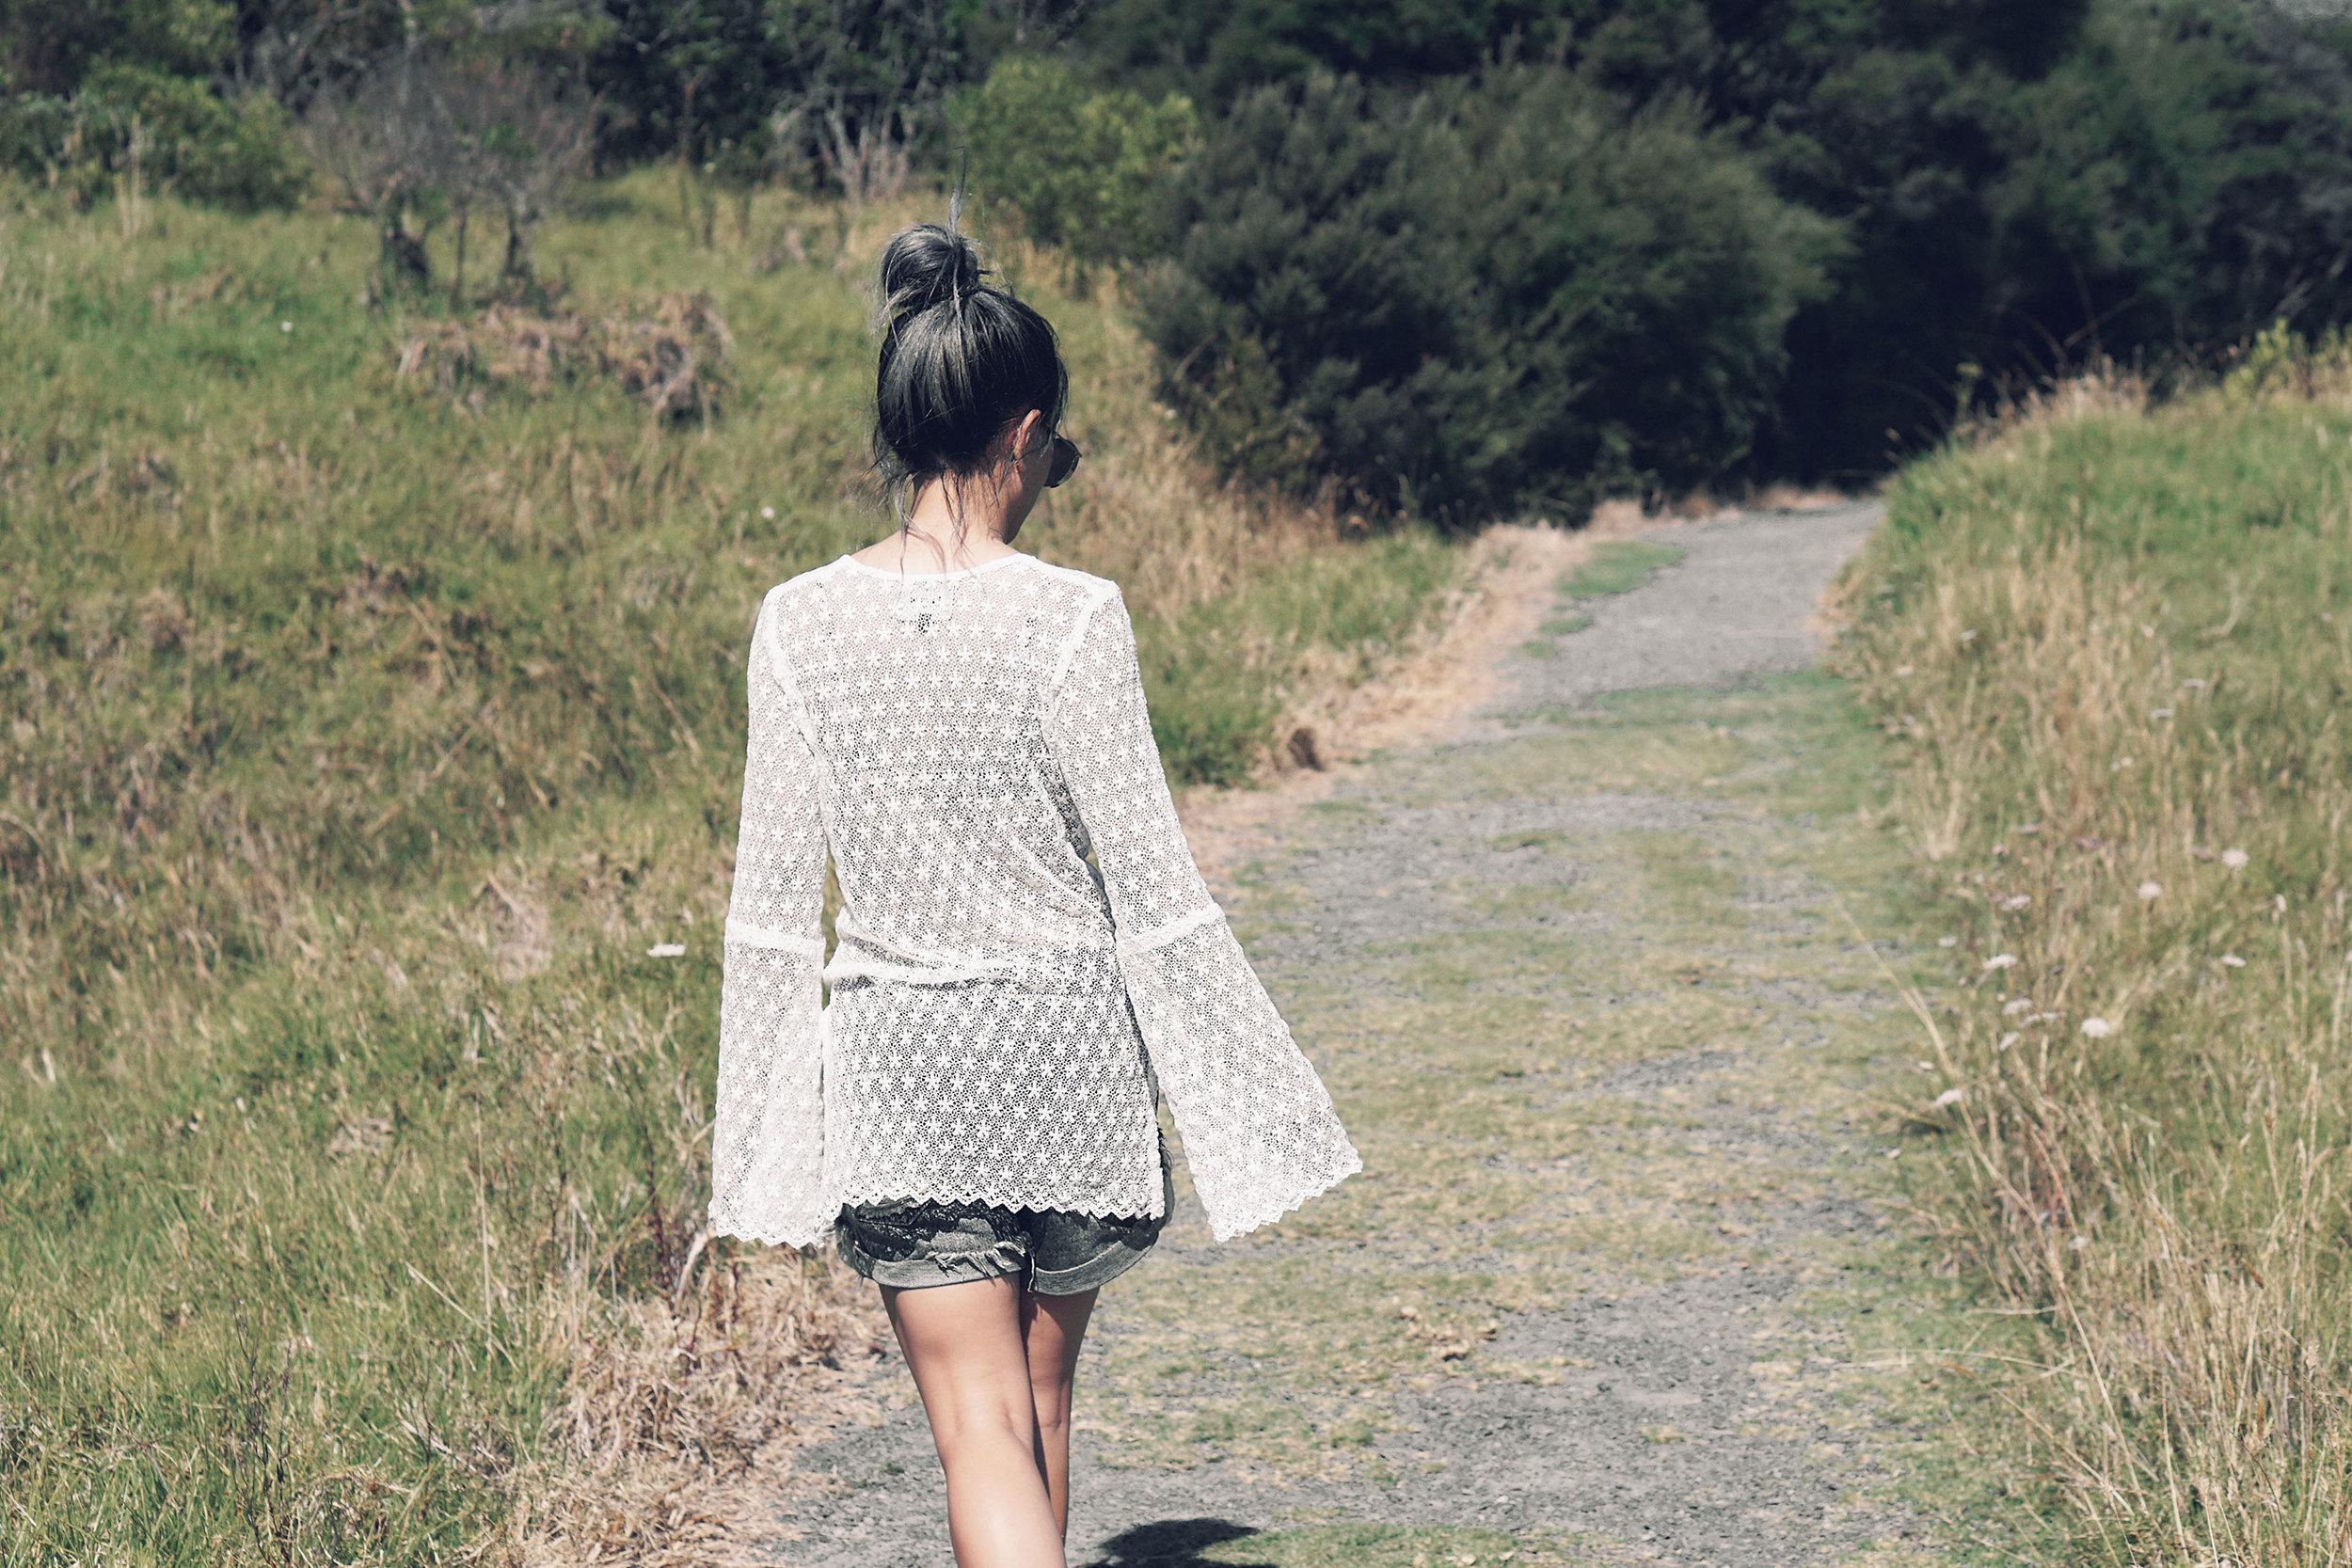 Vikkipedia-Staycation-Auckland-1-Blak-Lace-Img2-3x2.jpg